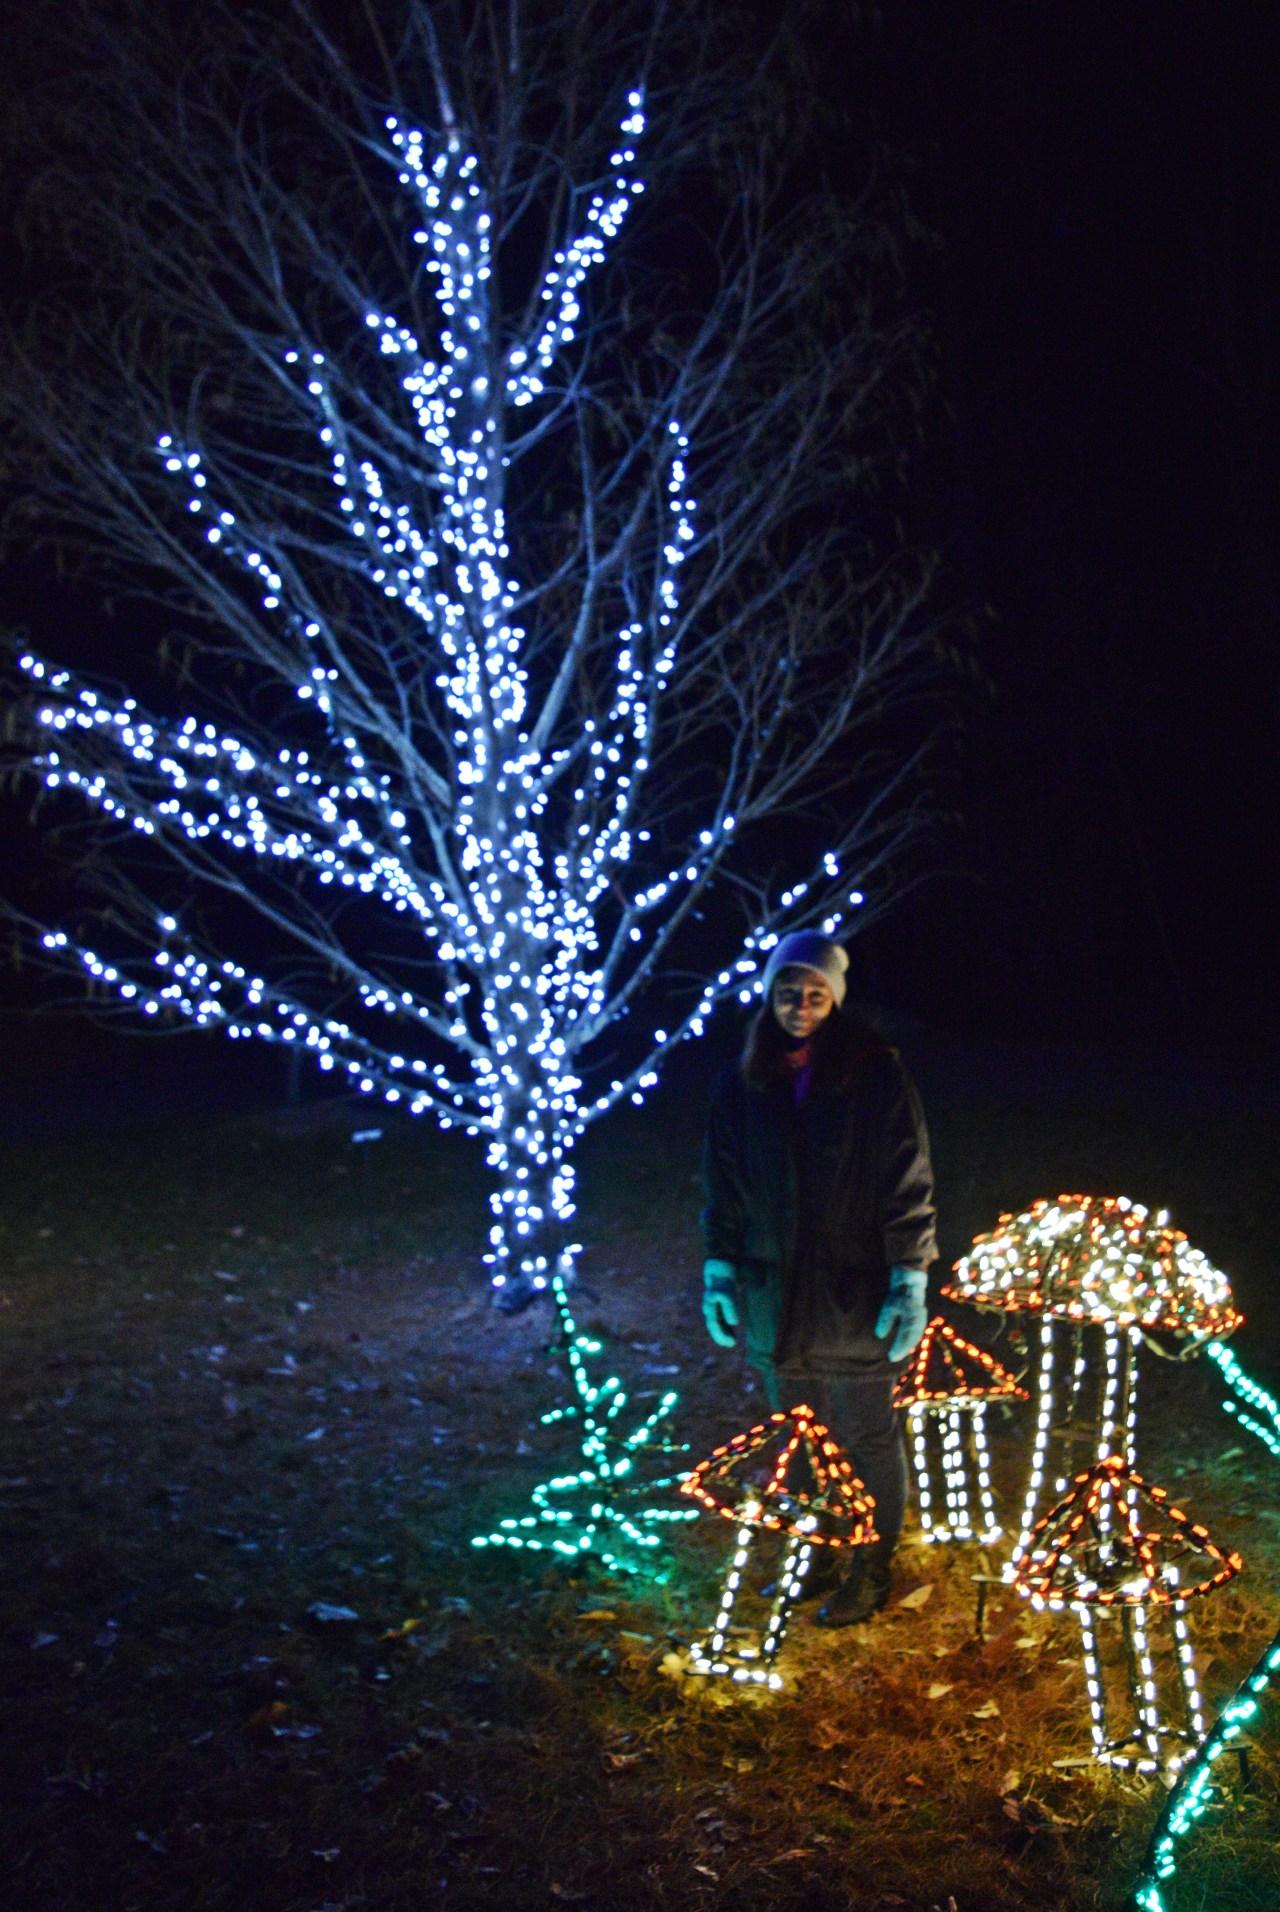 garden of lights life